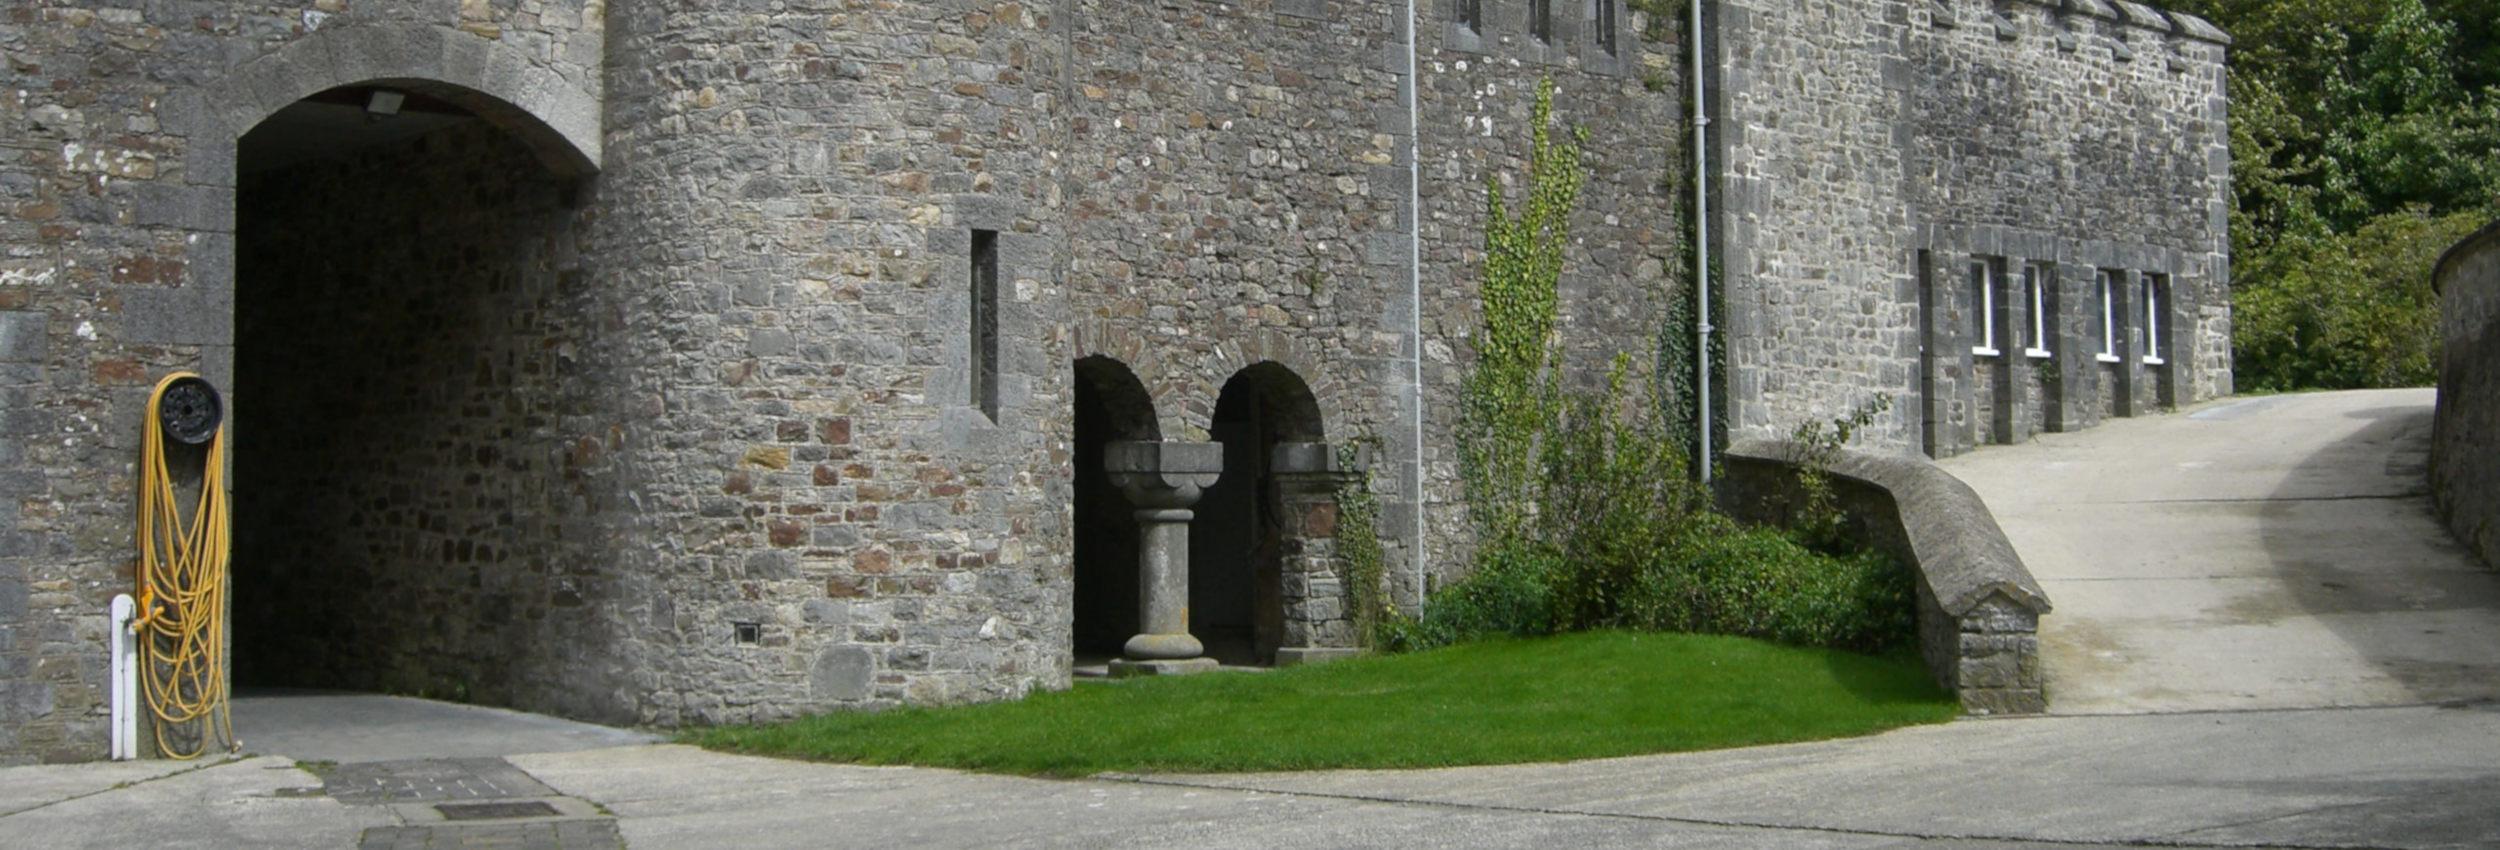 castle-banner-42